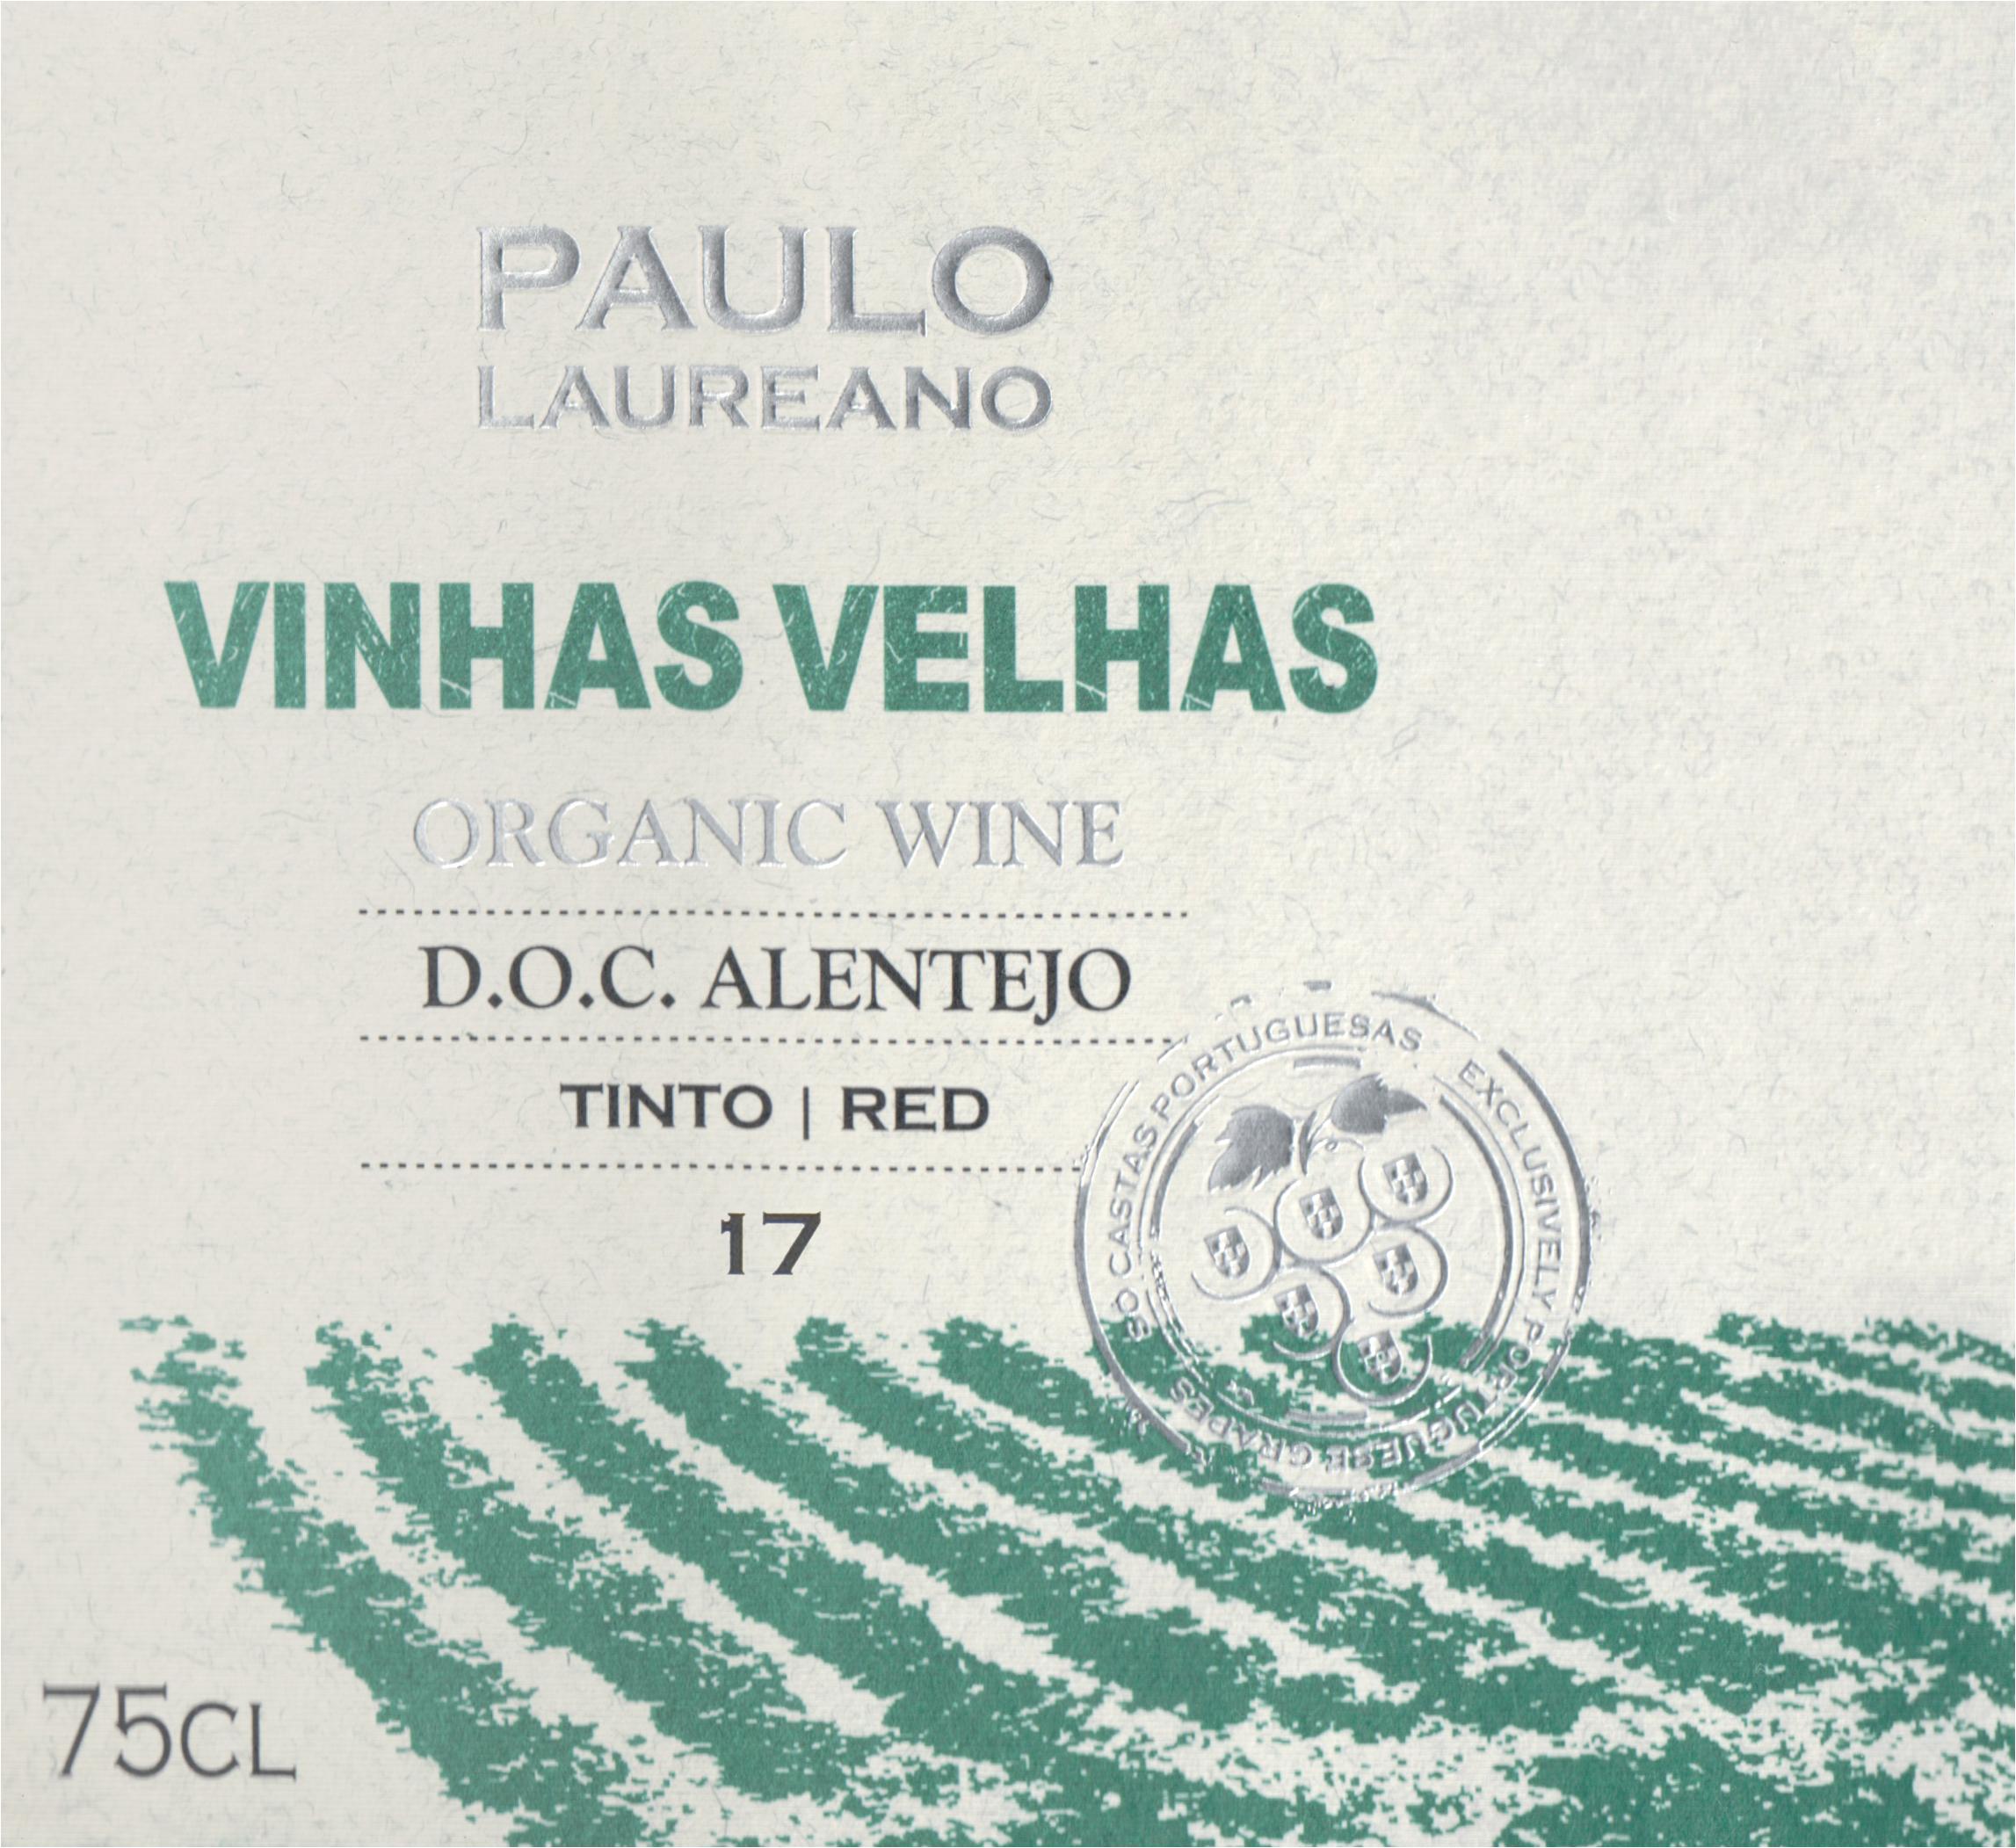 Paulo Laureano Vinhas Velhas Organic 2017